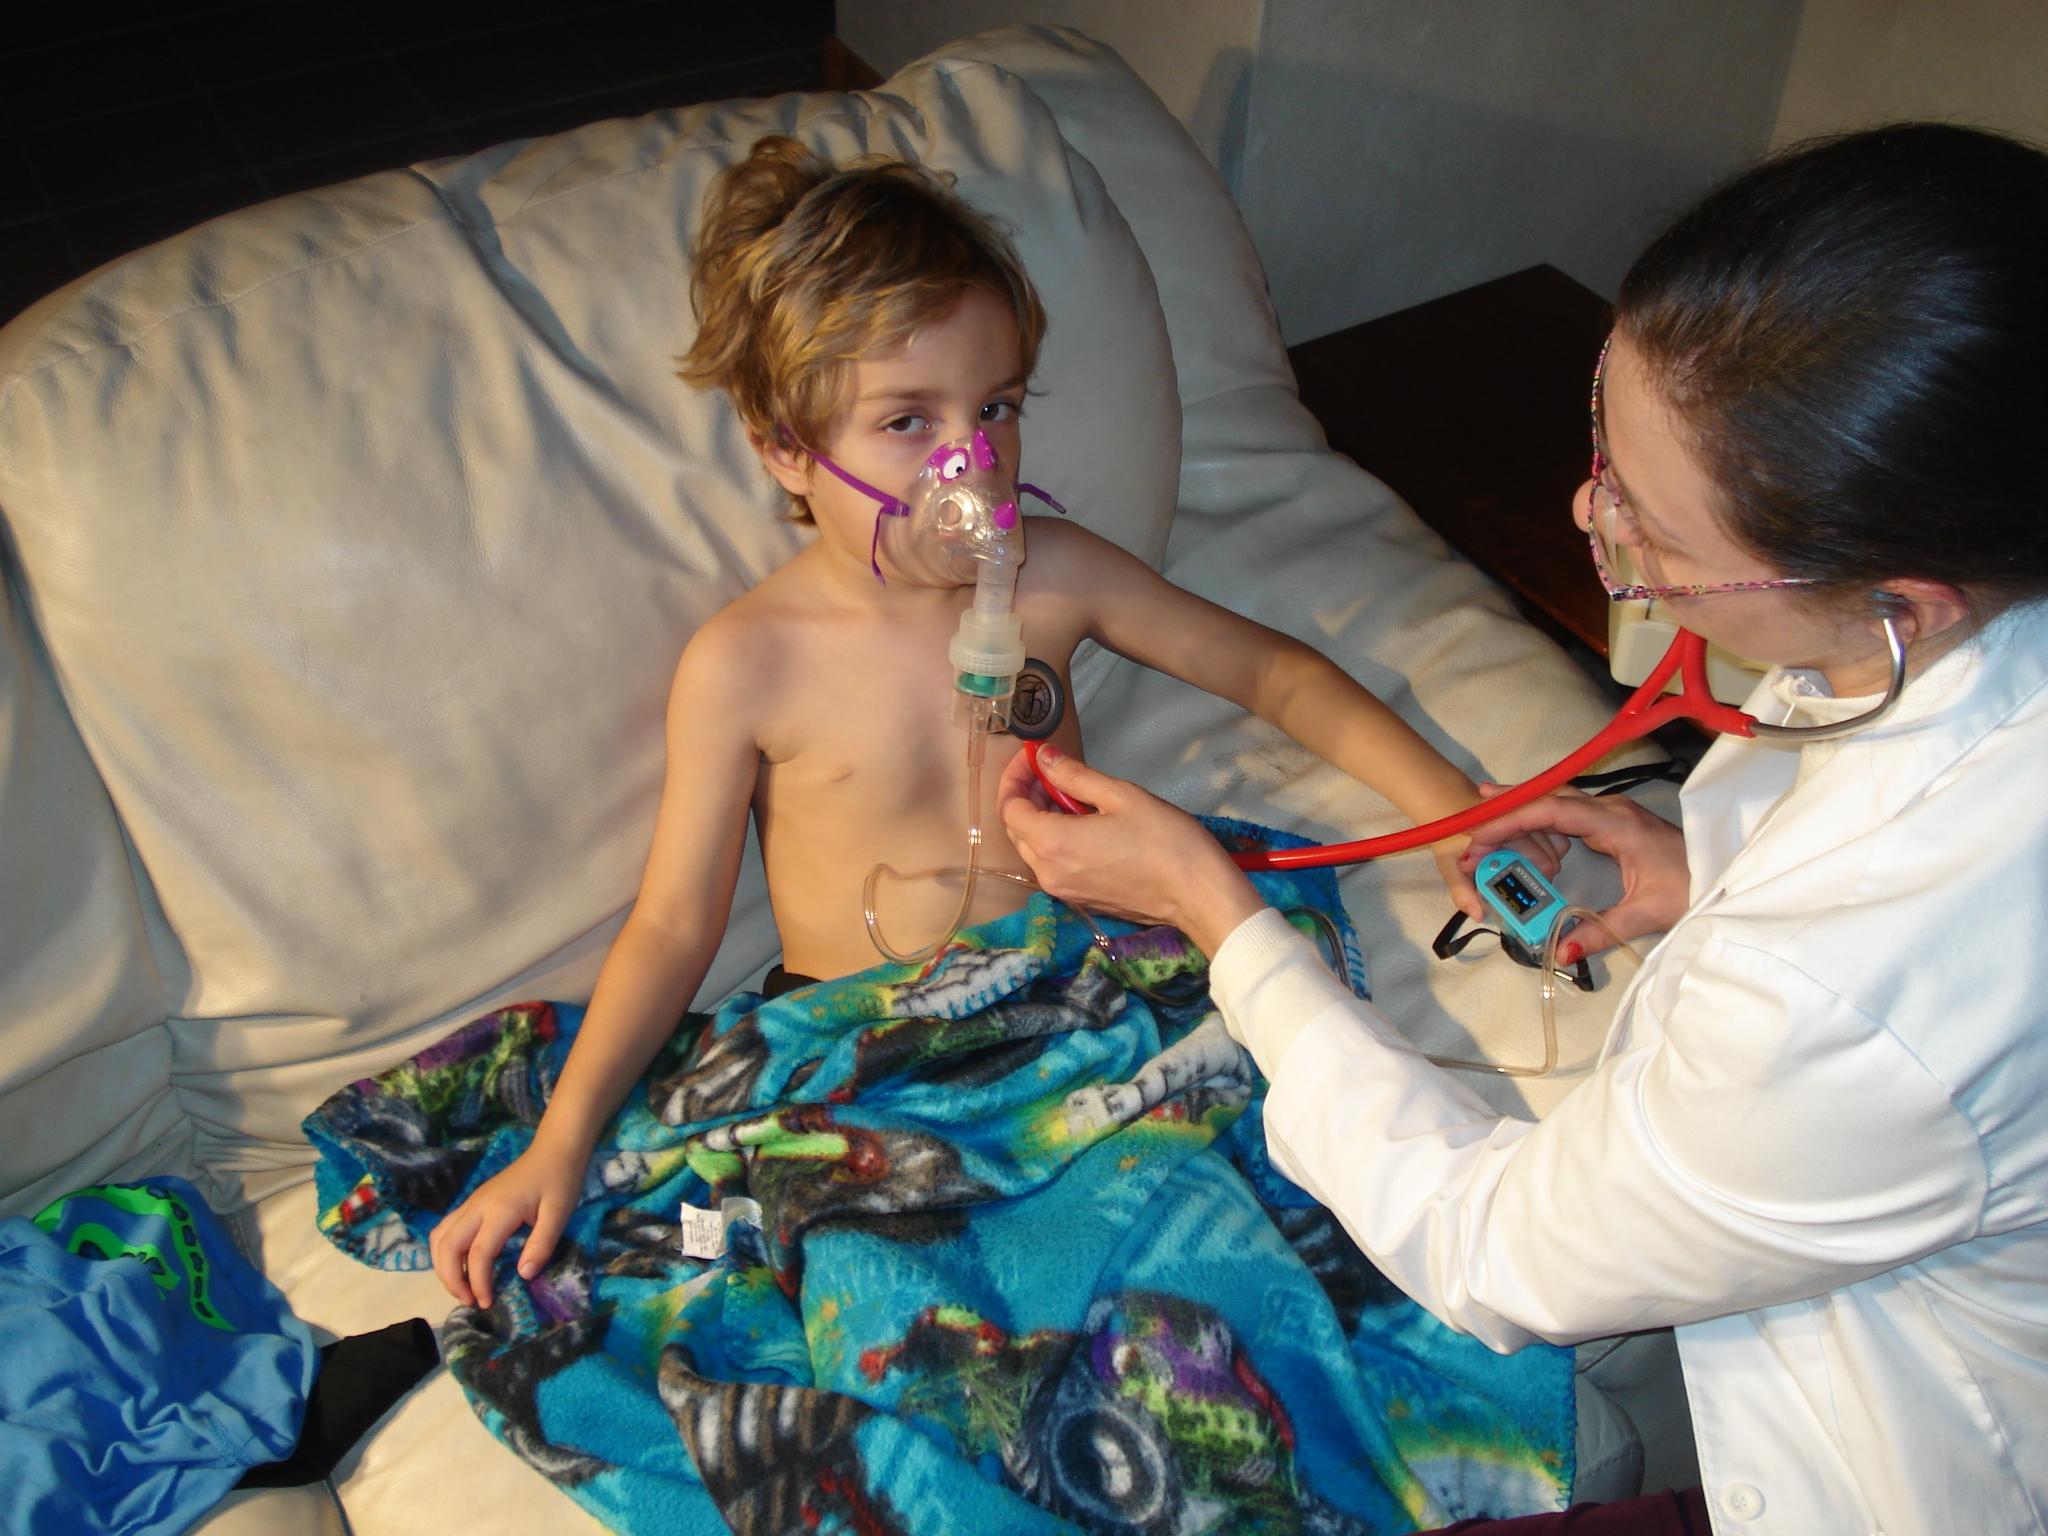 Nphs - Nurse Practitioner Health Services image 0